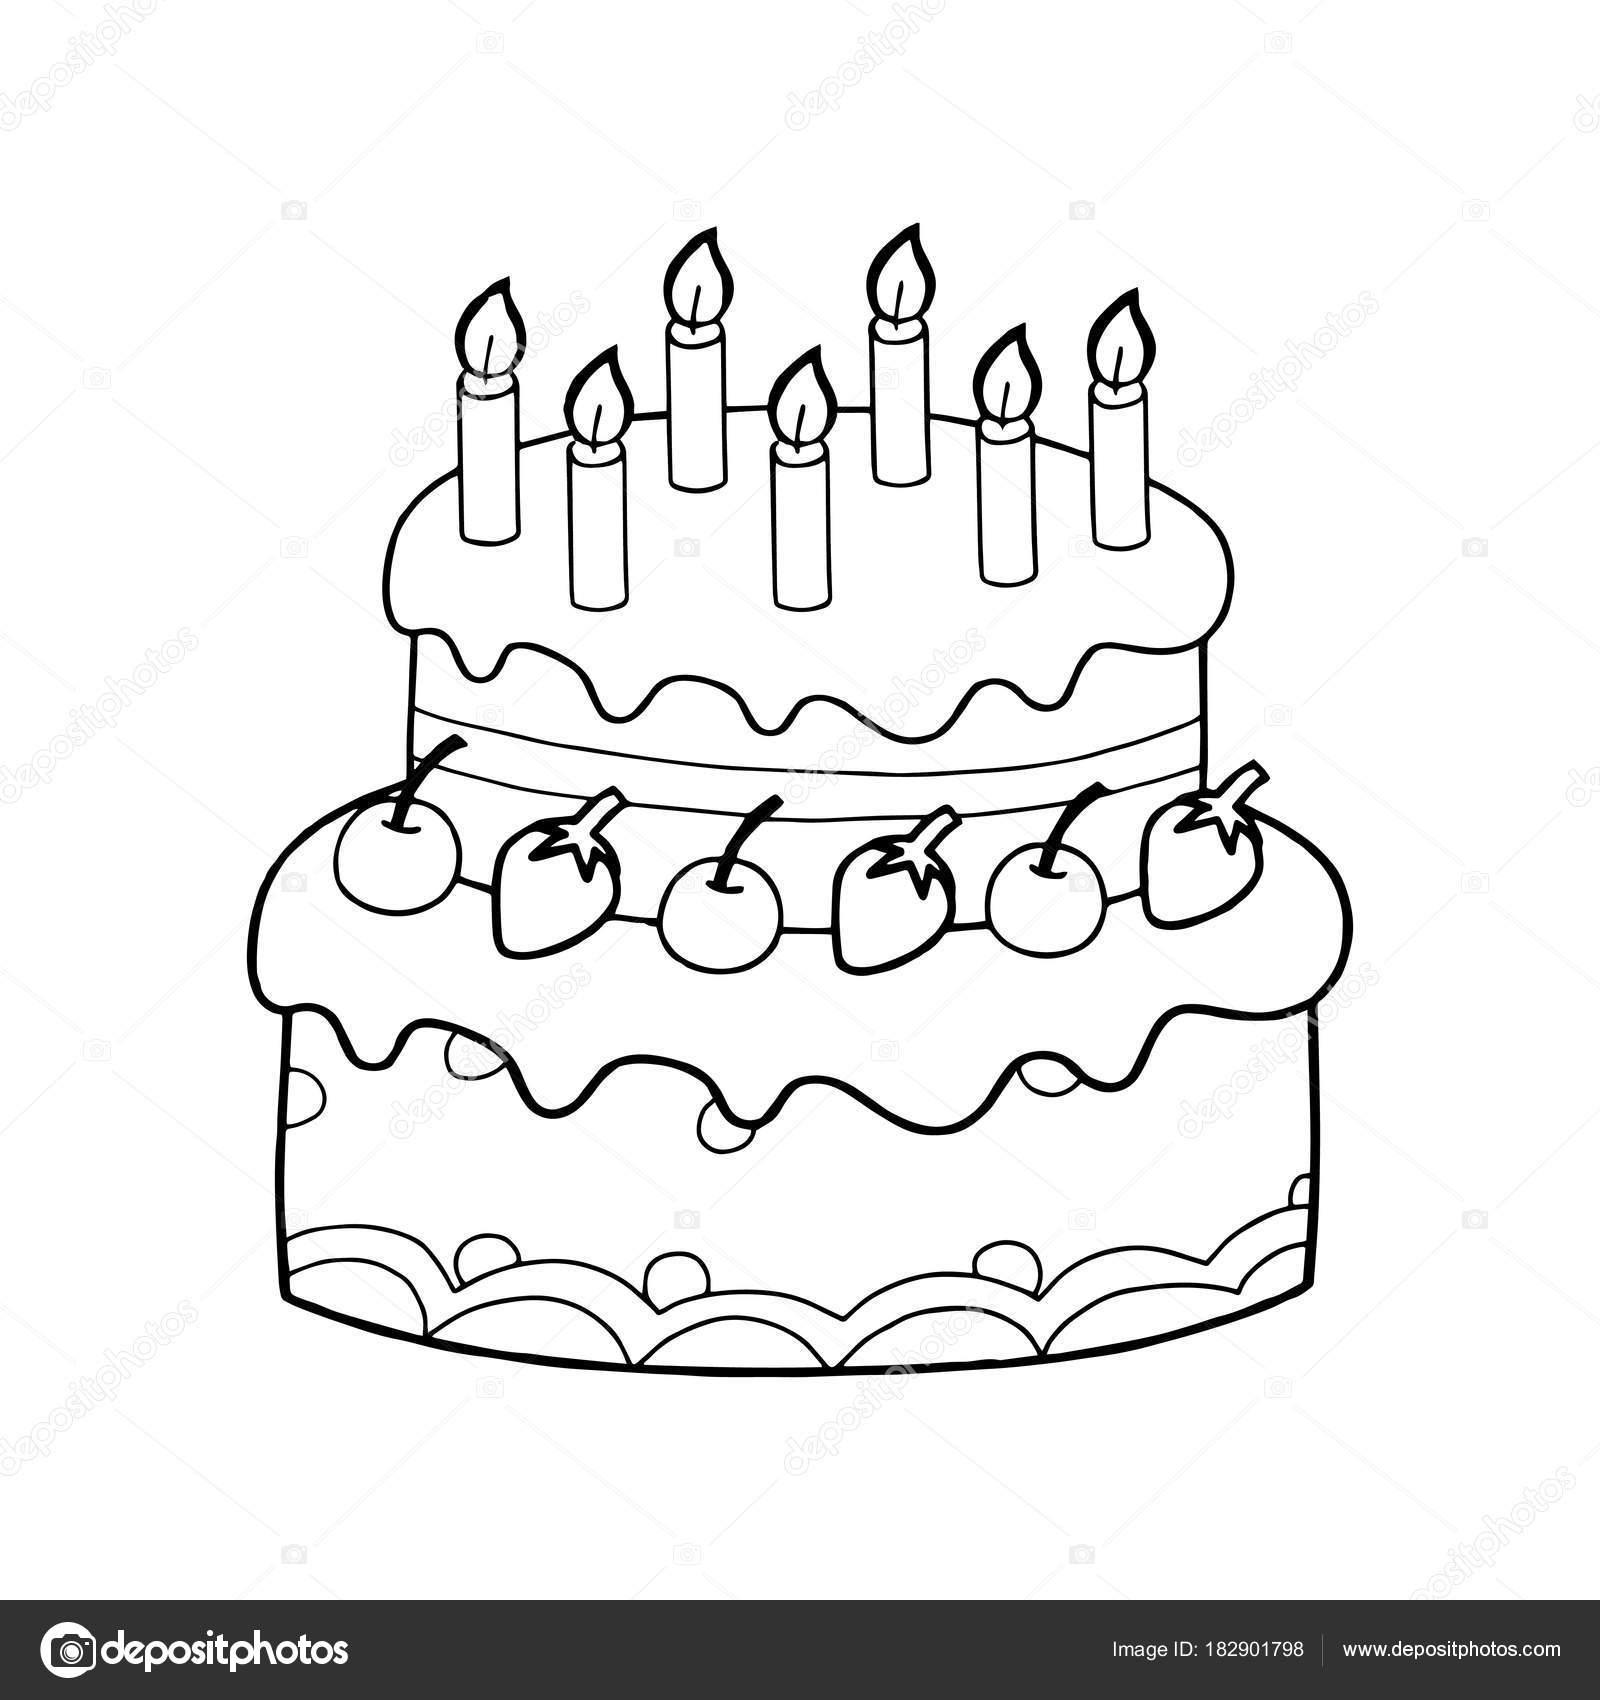 Cute Cartoon Cake White Background Childrens Prints Shirt Color Book Stock Vector C Foxynguyen 182901798